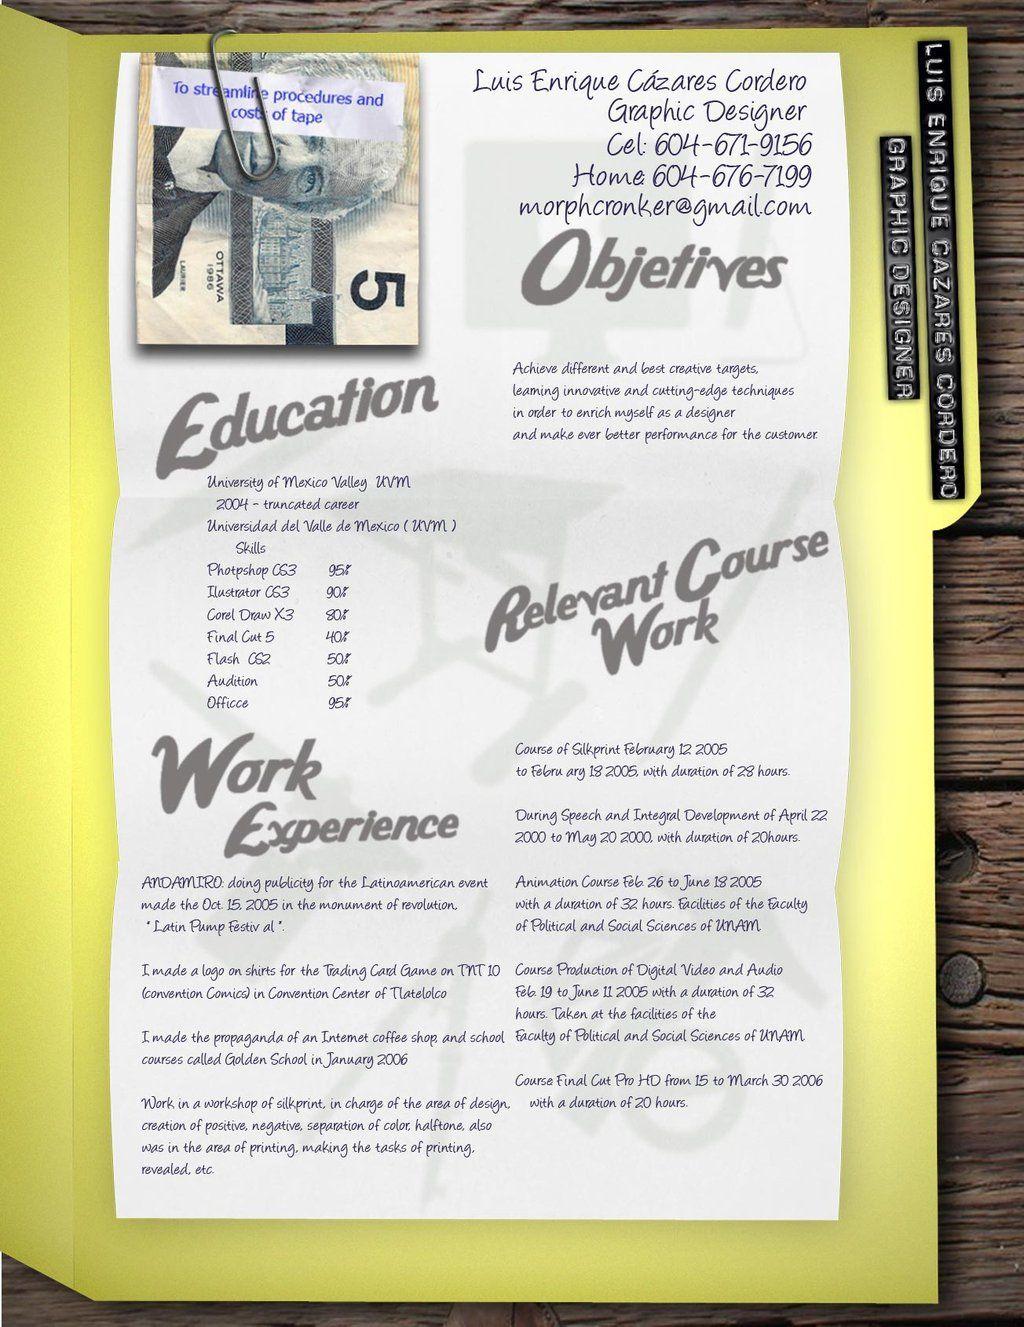 Best Resume Builder Online Free Download